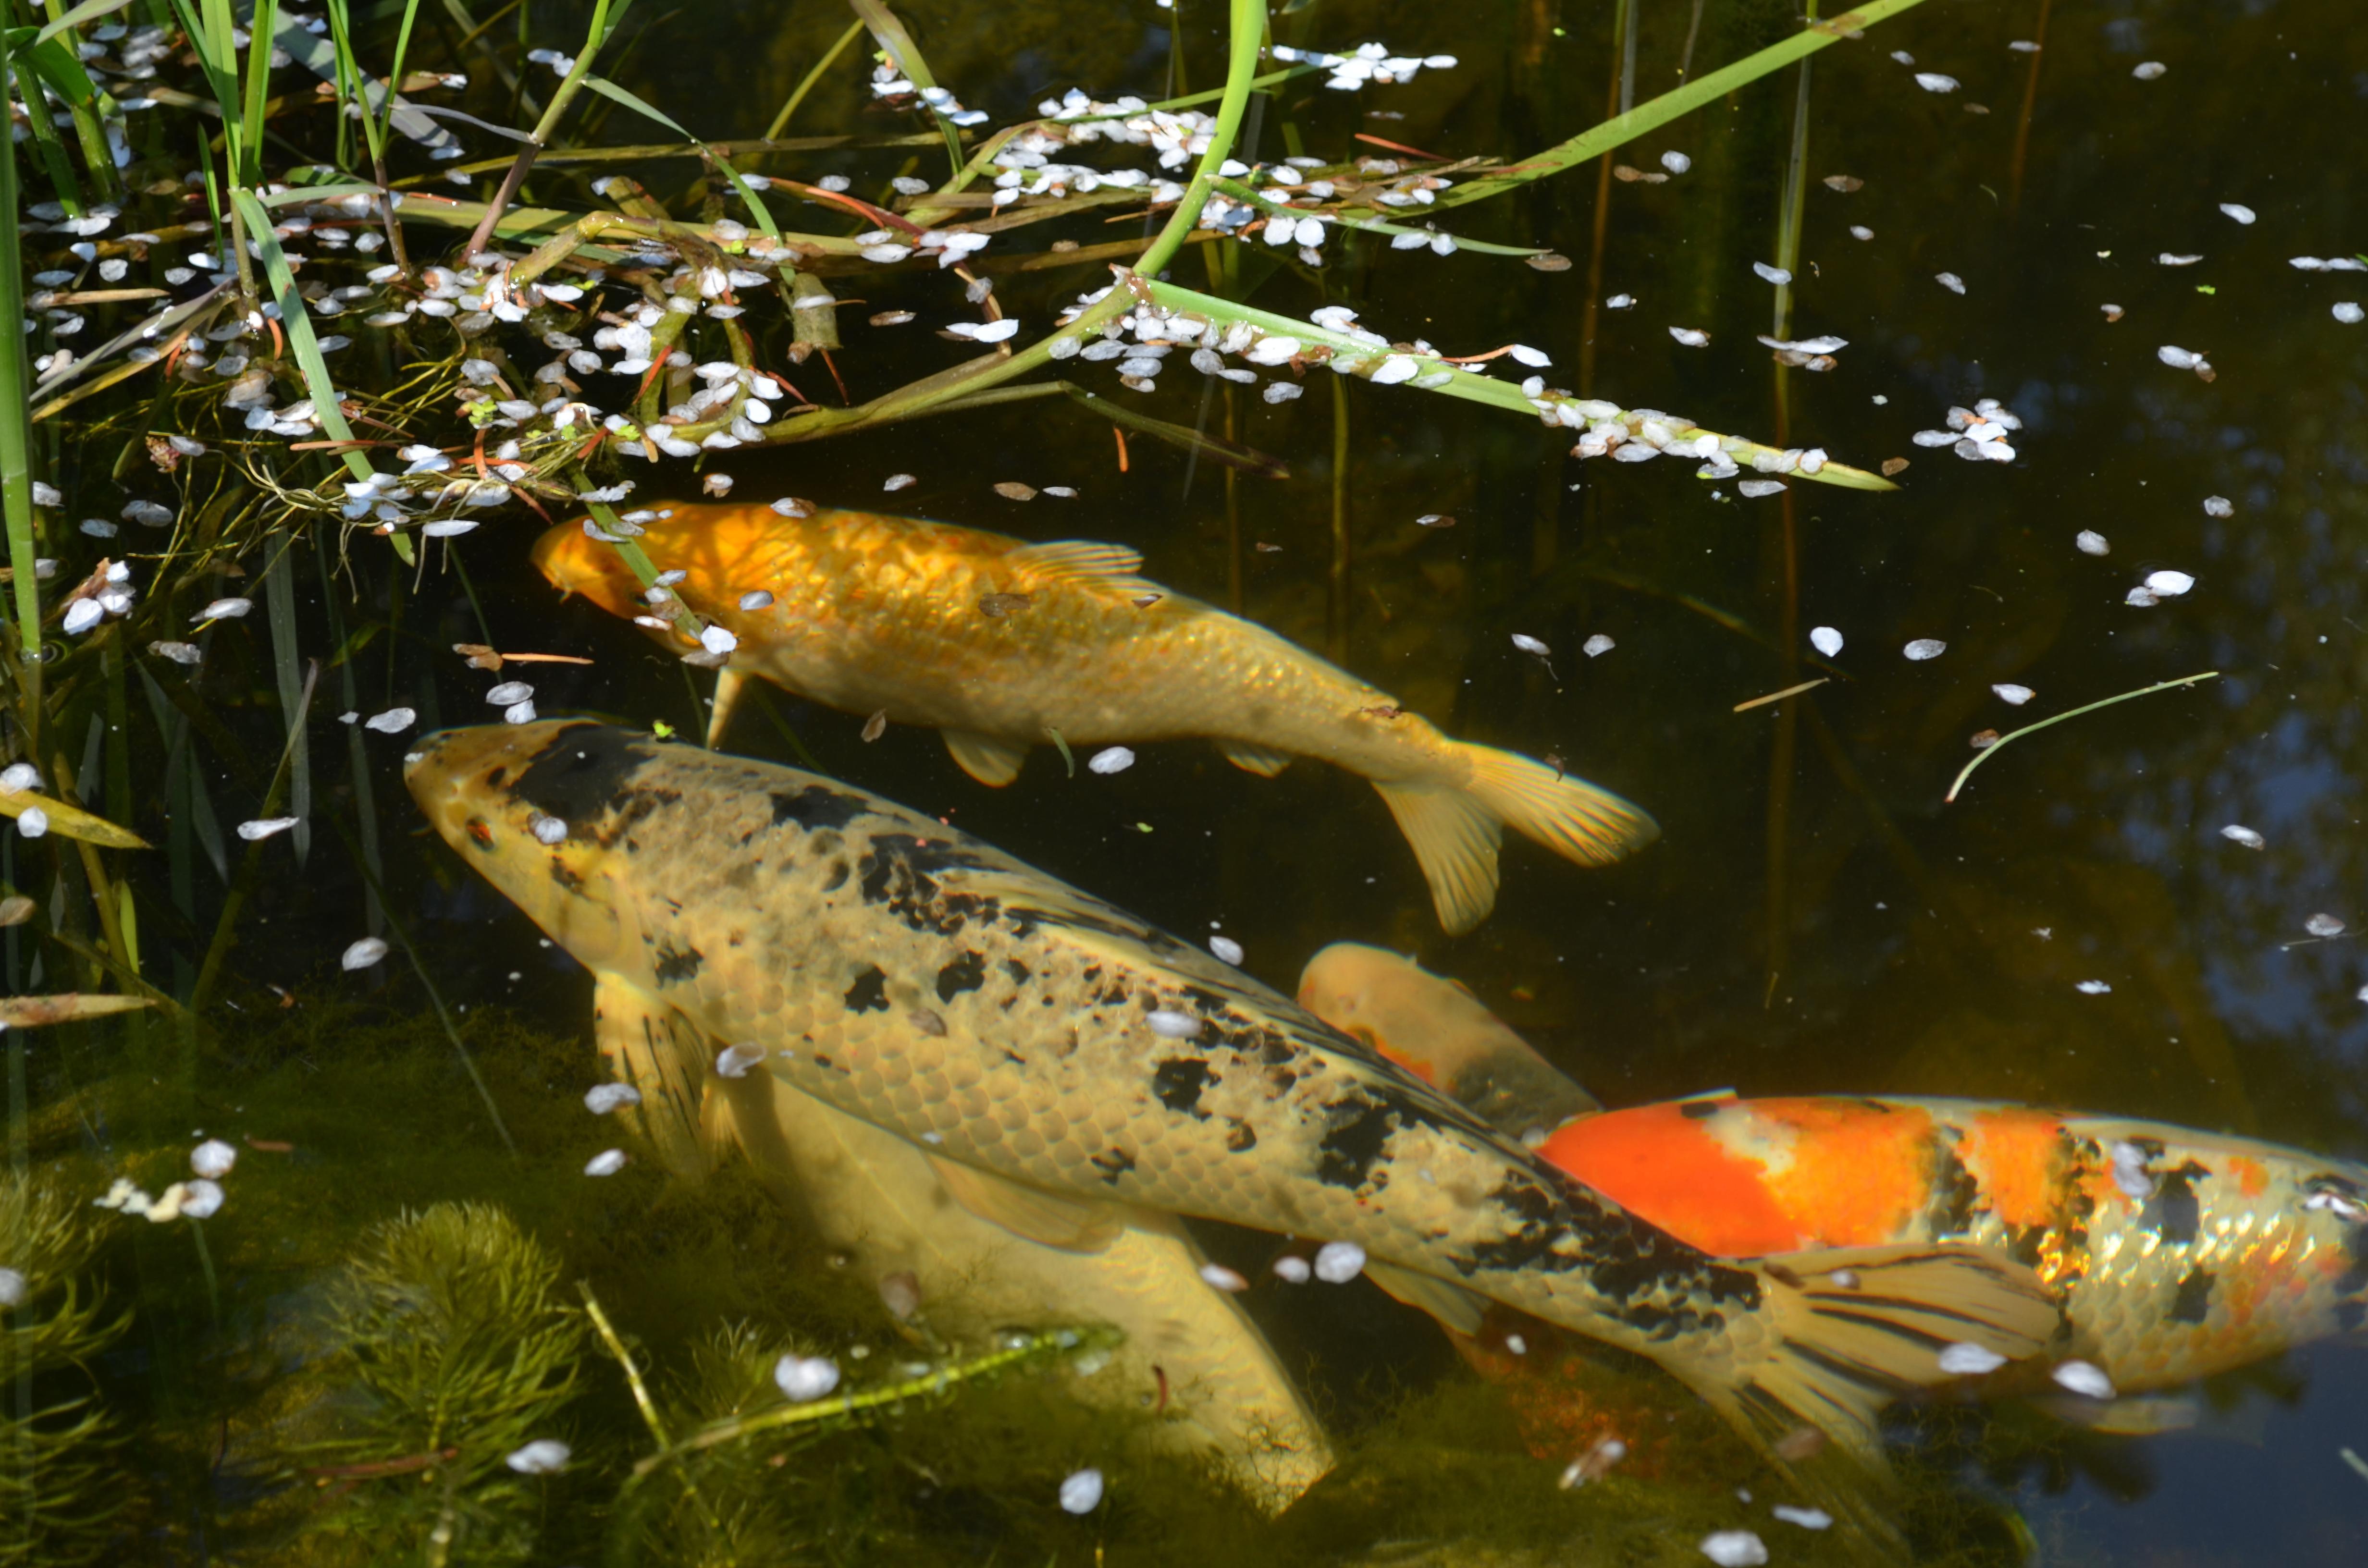 Gambar  Budidaya Ikan  Kolam Koi  Minimalis Gambar  Hias di